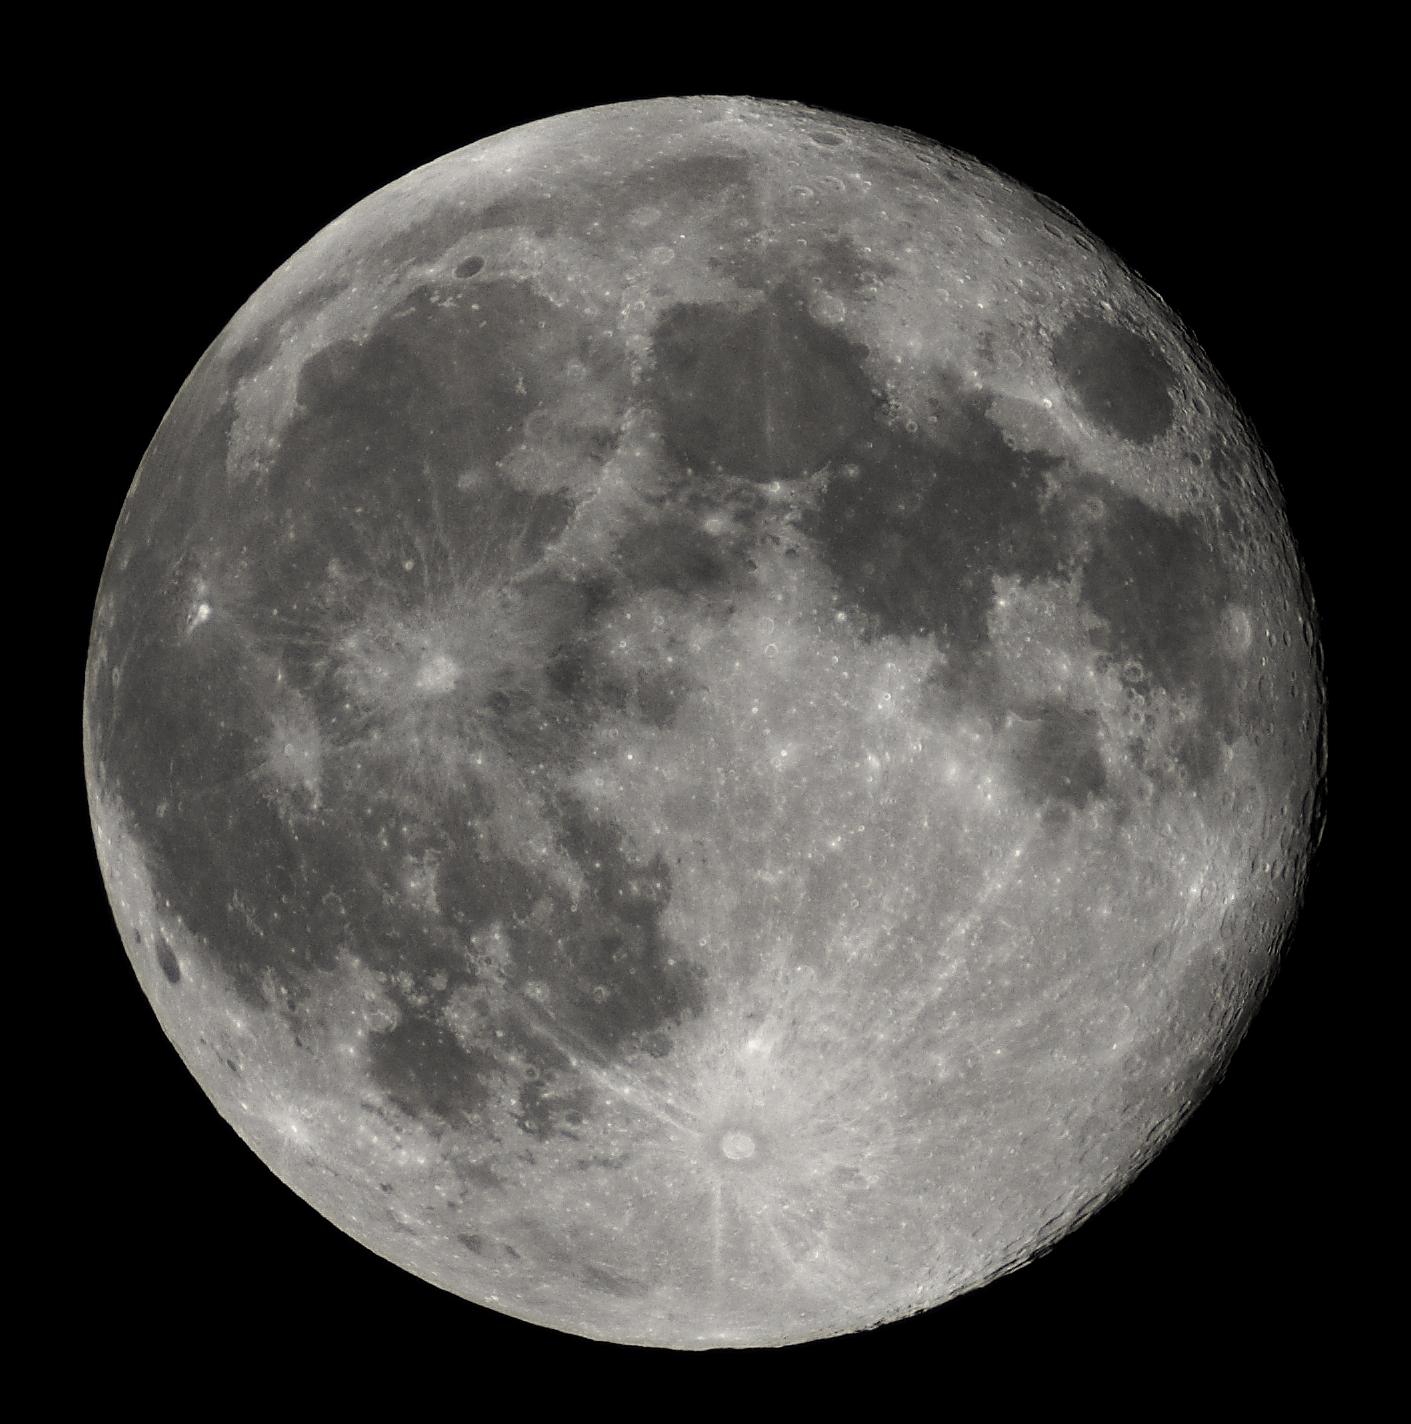 File:Full Moon Luc Viatour.jpg - Wikipedia